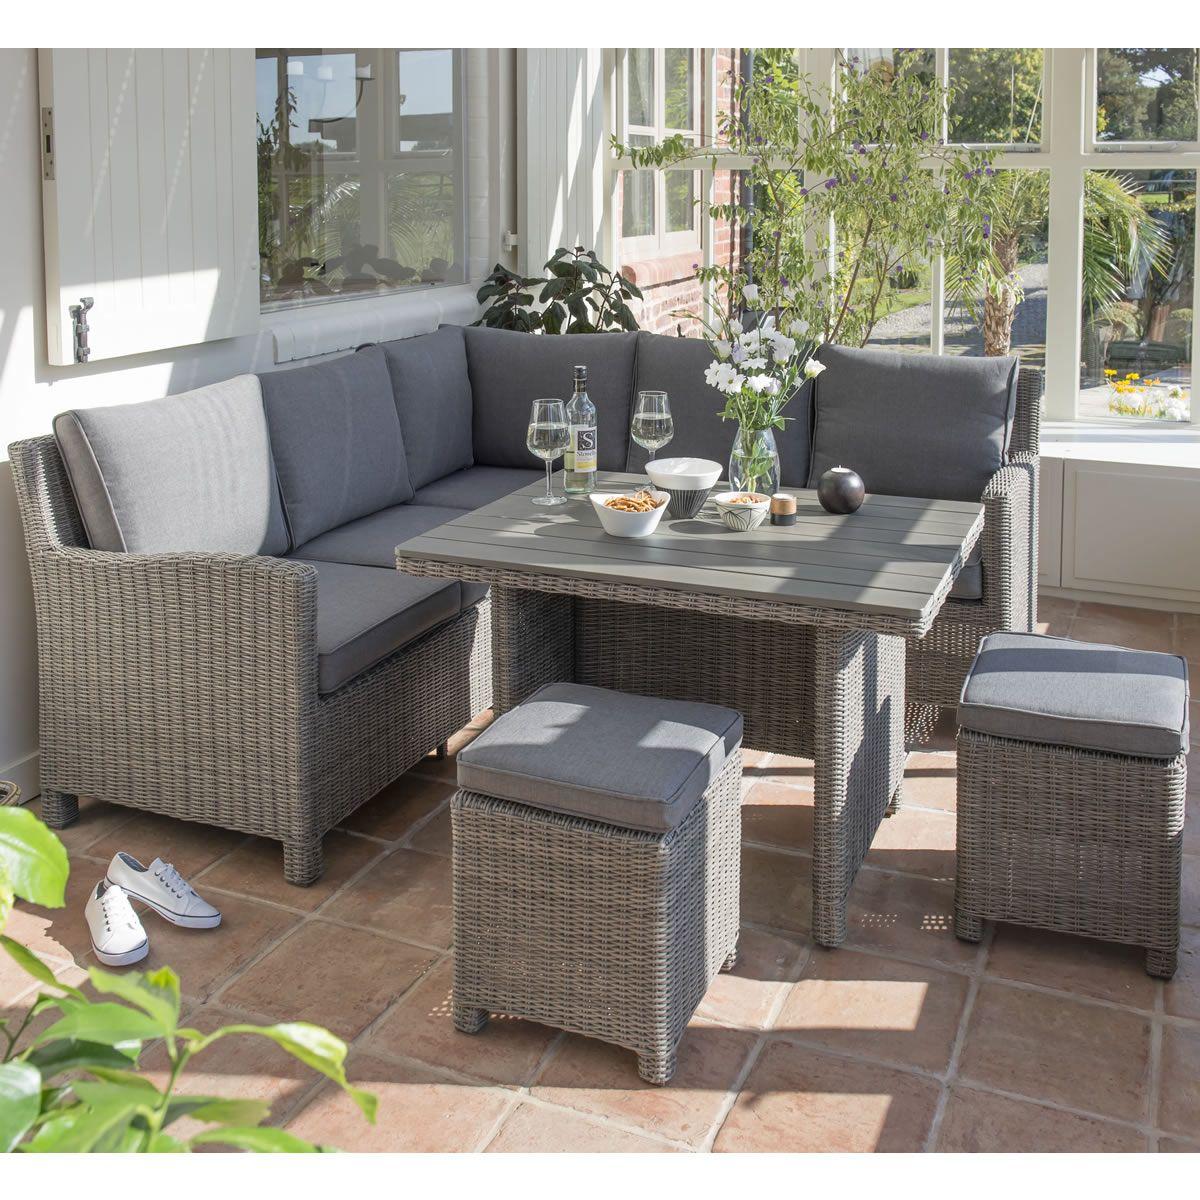 Kettler Palma Mini Corner Set Rattan With Taupe Cushions   (0193335 2100C)    Garden Furniture World